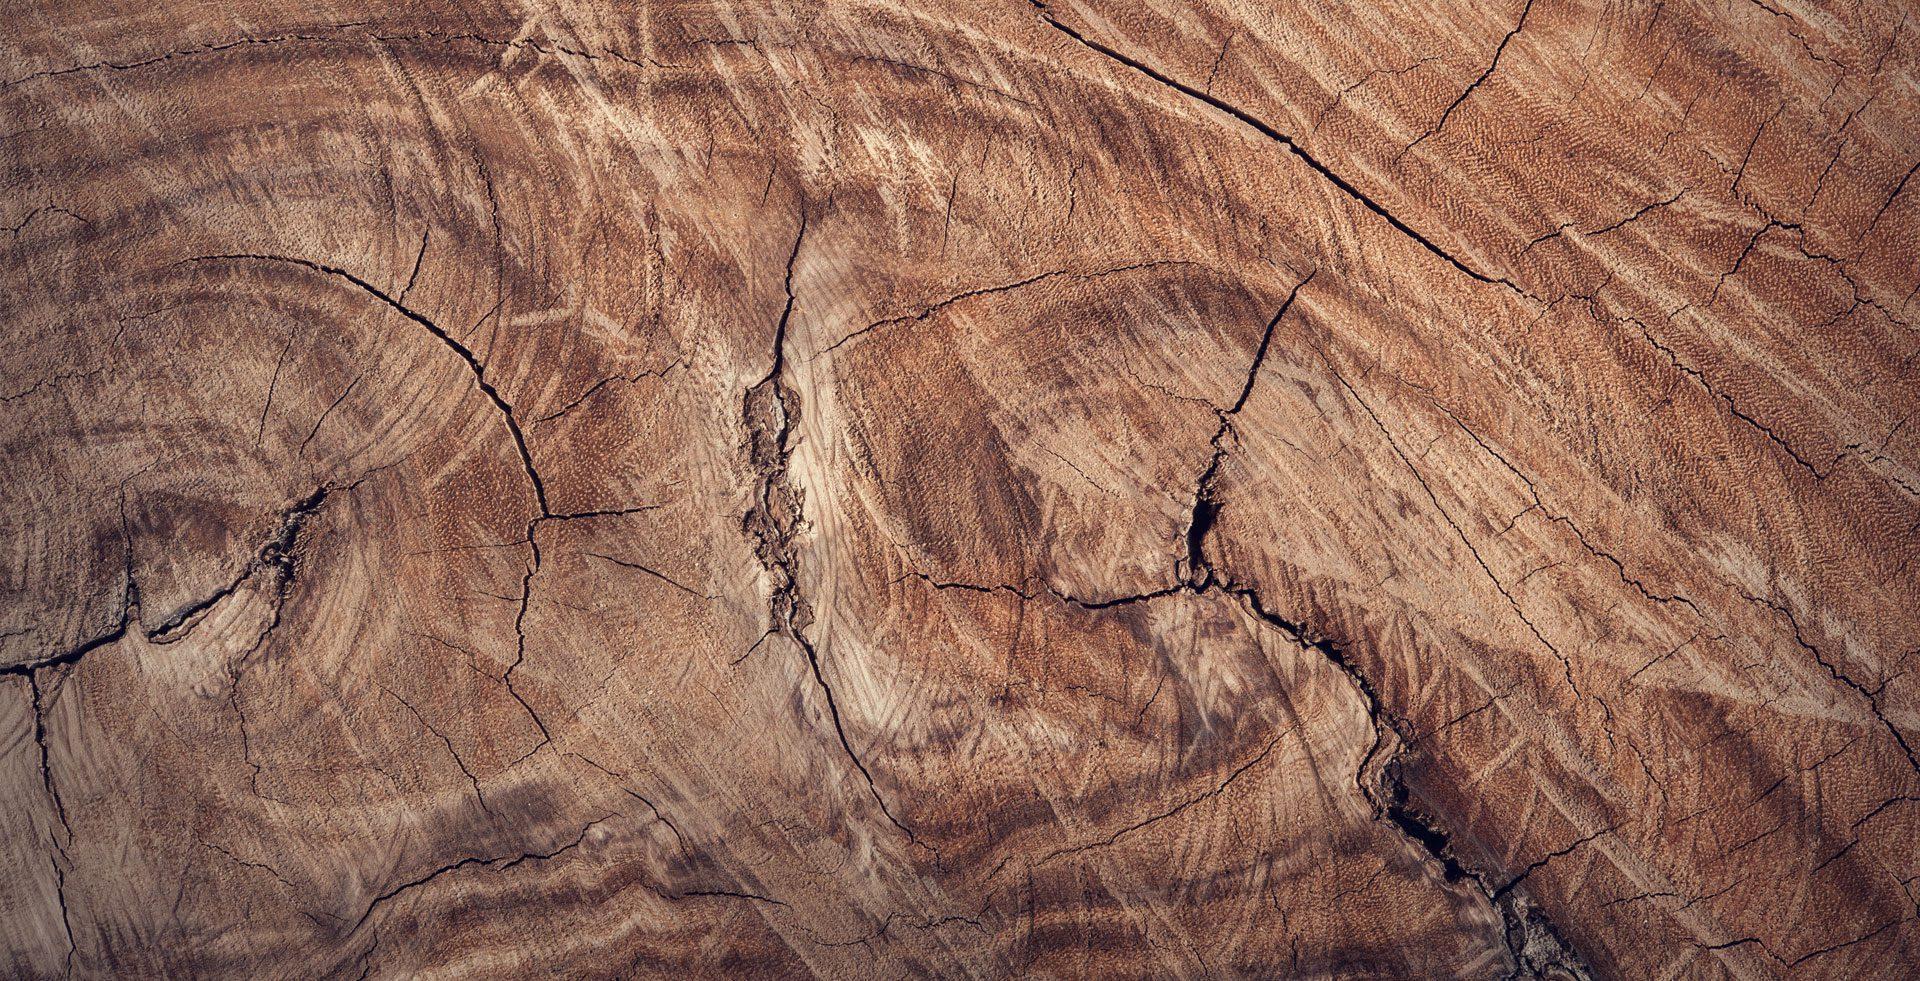 Holz als Baustoff